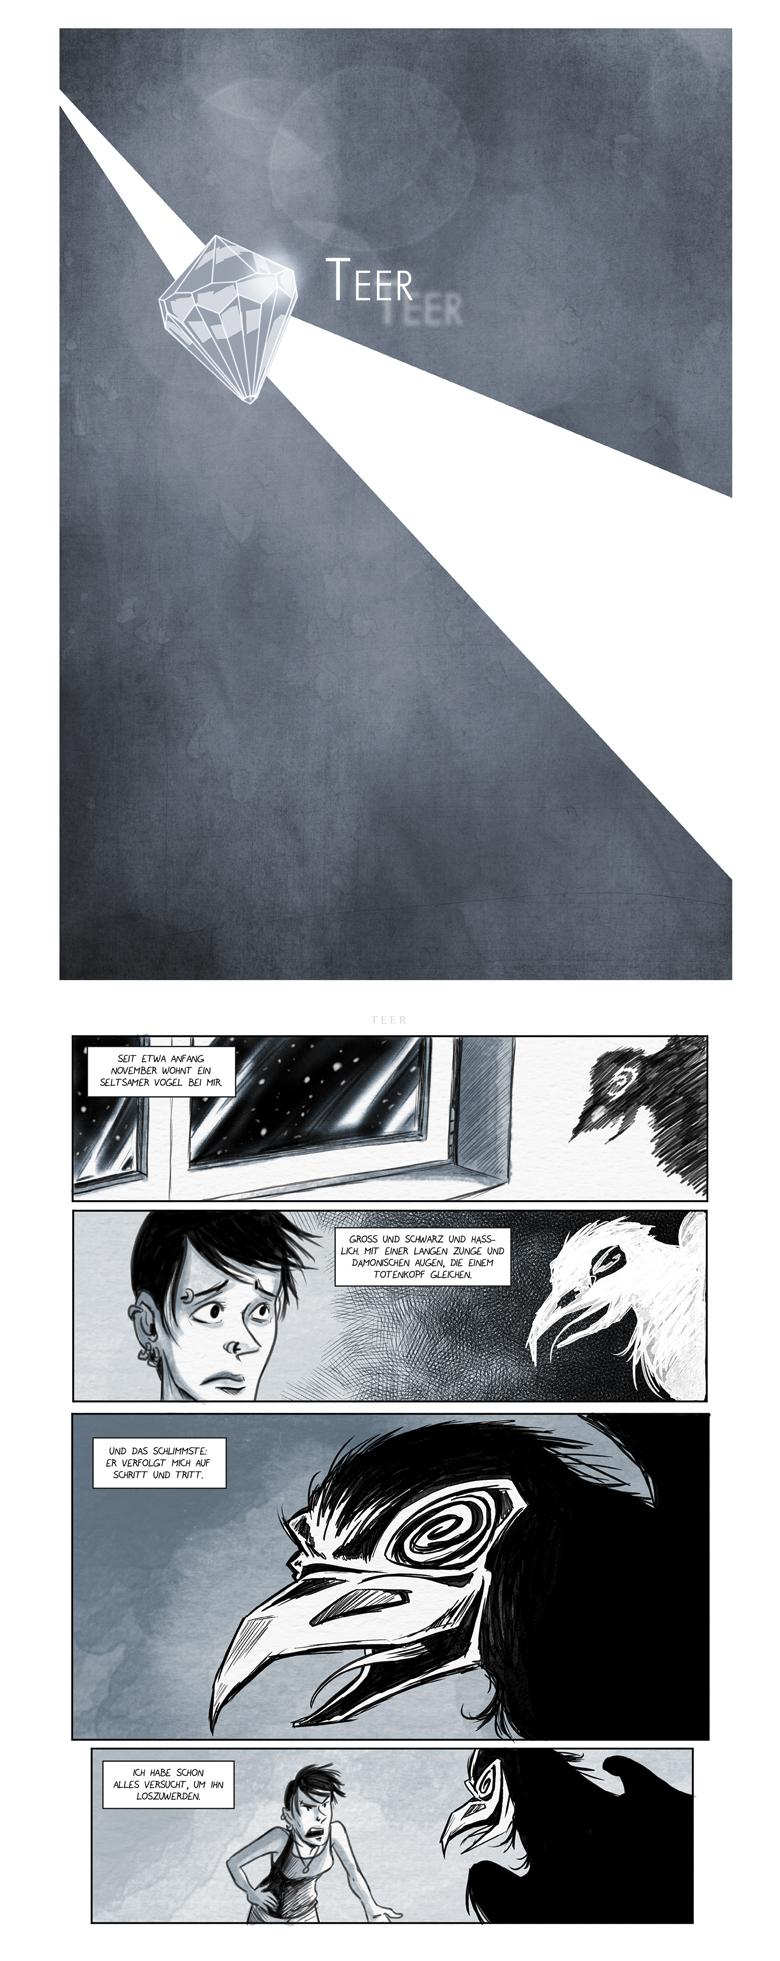 Teer – Seite 1